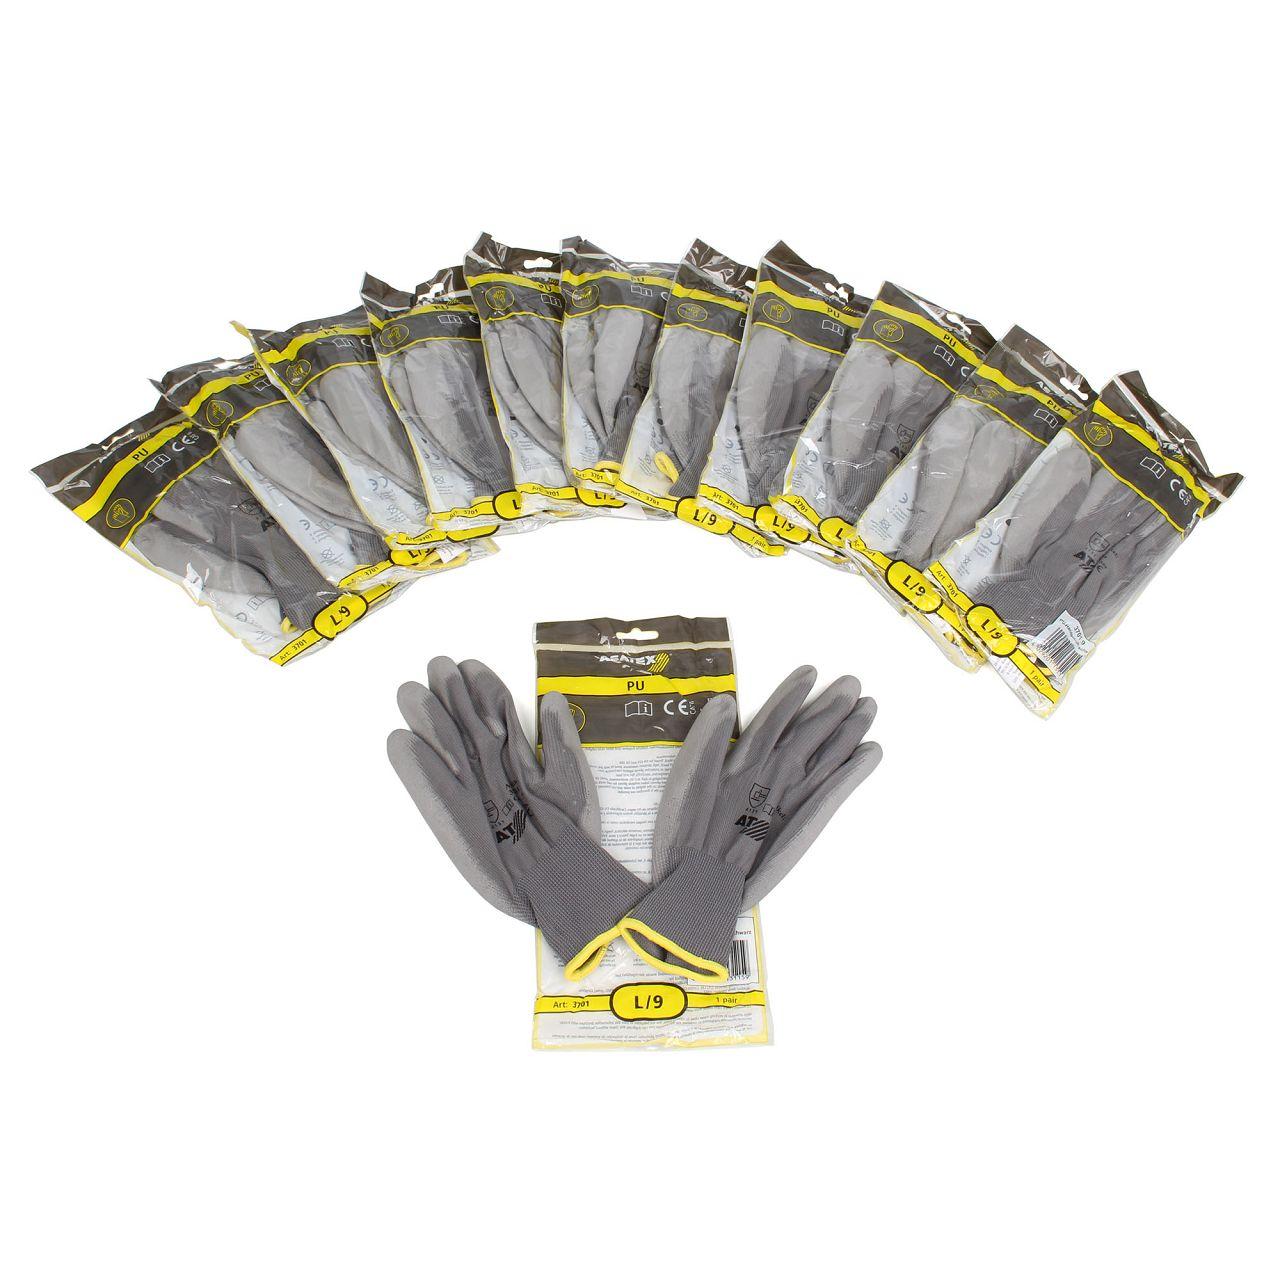 ASATEX 3701 Handschuhe Arbeitshandschuhe GUMMIERT - GRAU Größe 9 / L (12 Paar)